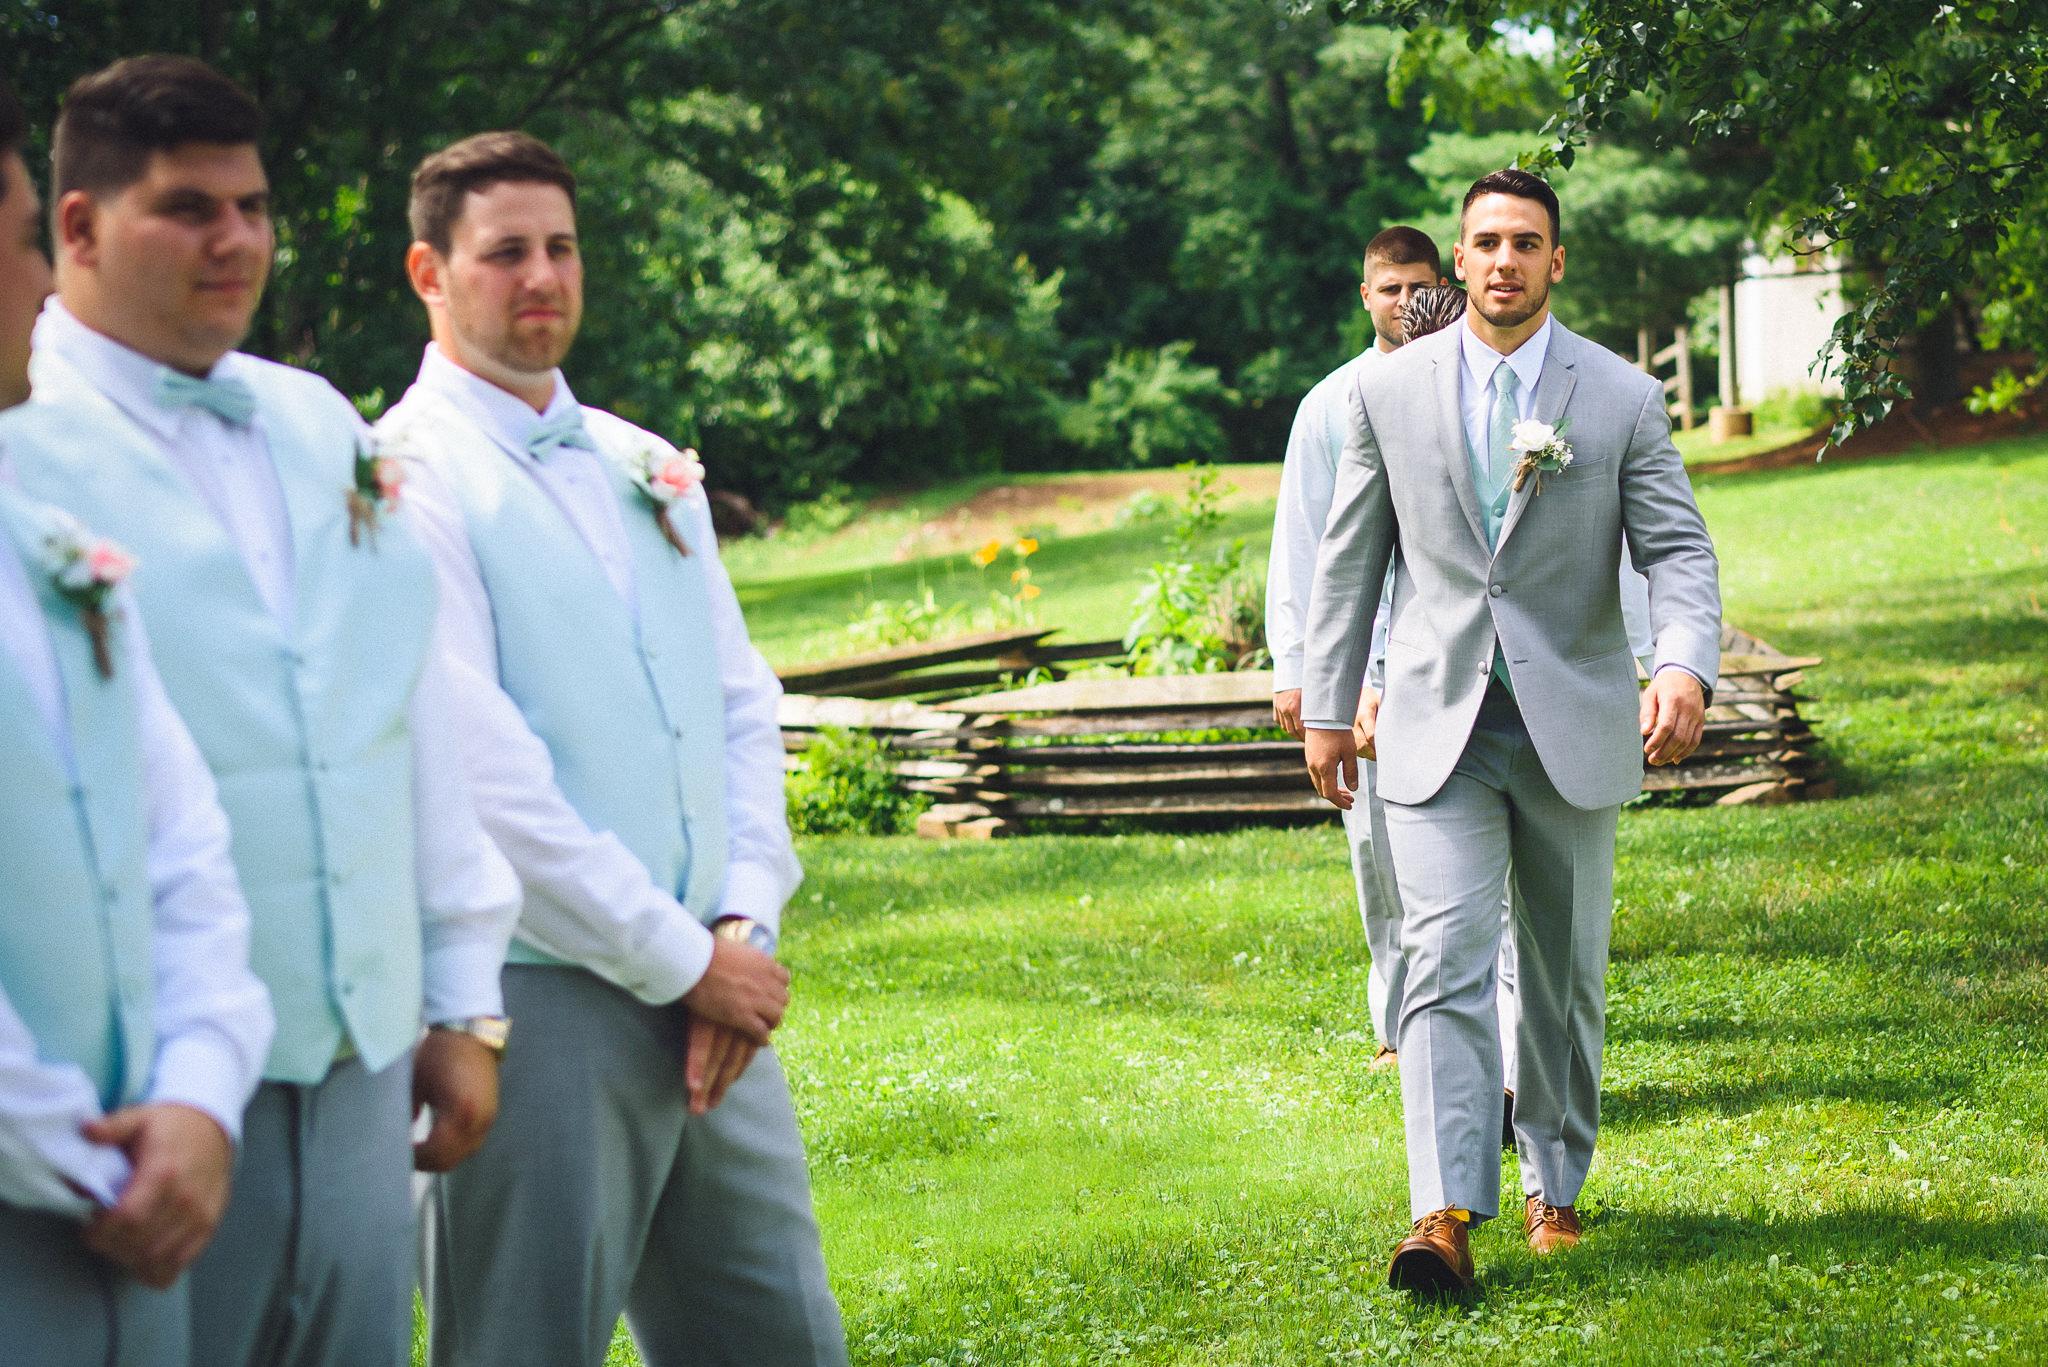 Historic-Stonebrook-Farm-Wedding-Photographer-0021.jpg